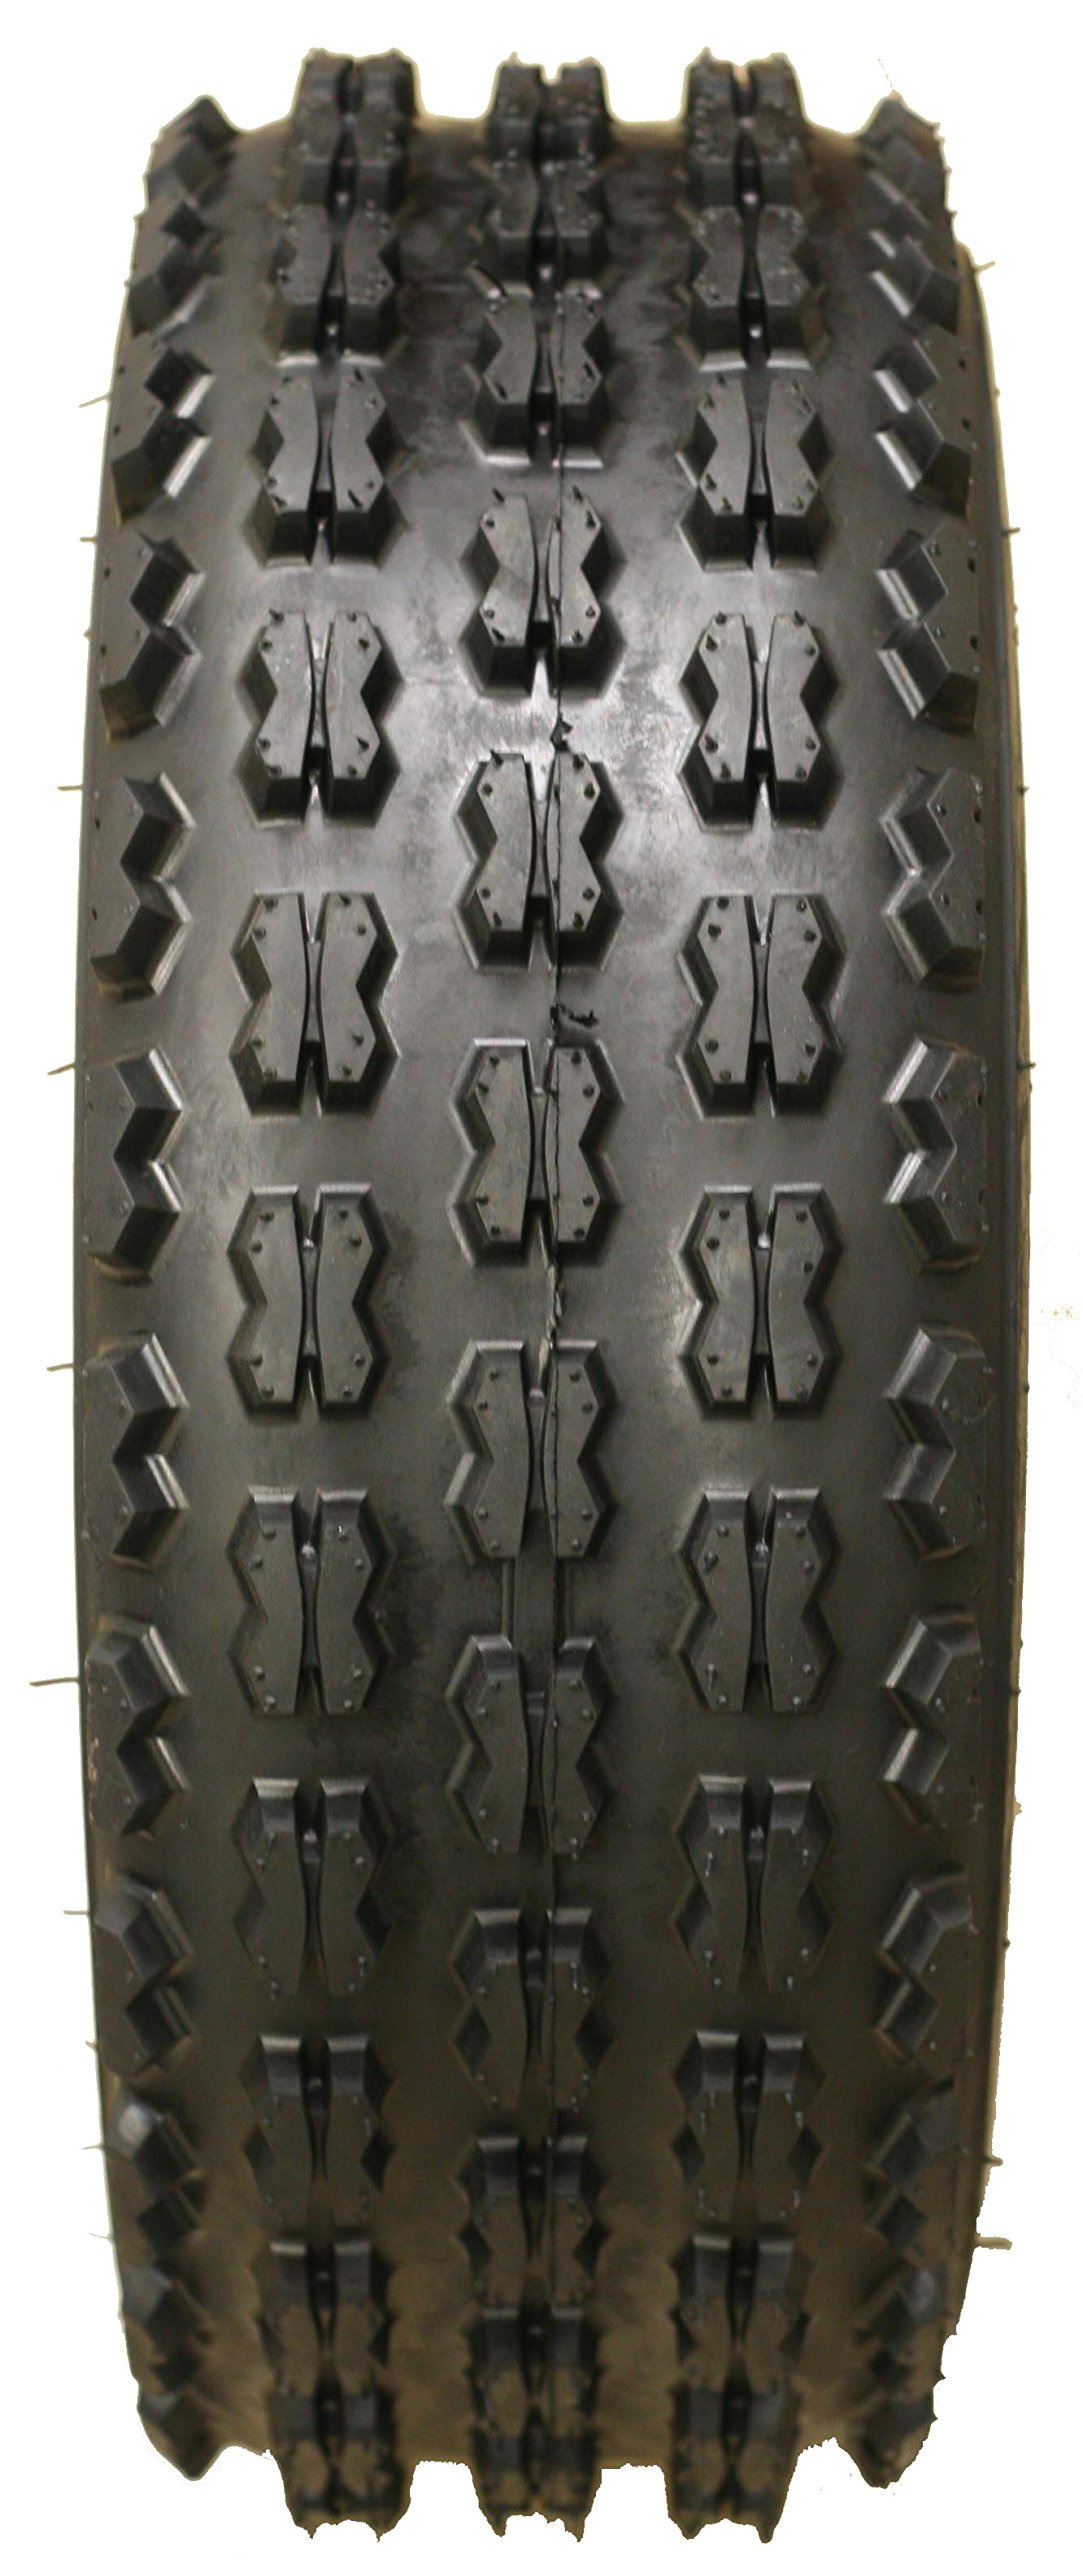 Set of 4 New Sport ATV Tires 21x7-10 Front & 20x10-9 Rear /4PR - 10075/10081 by Wanda (Image #5)